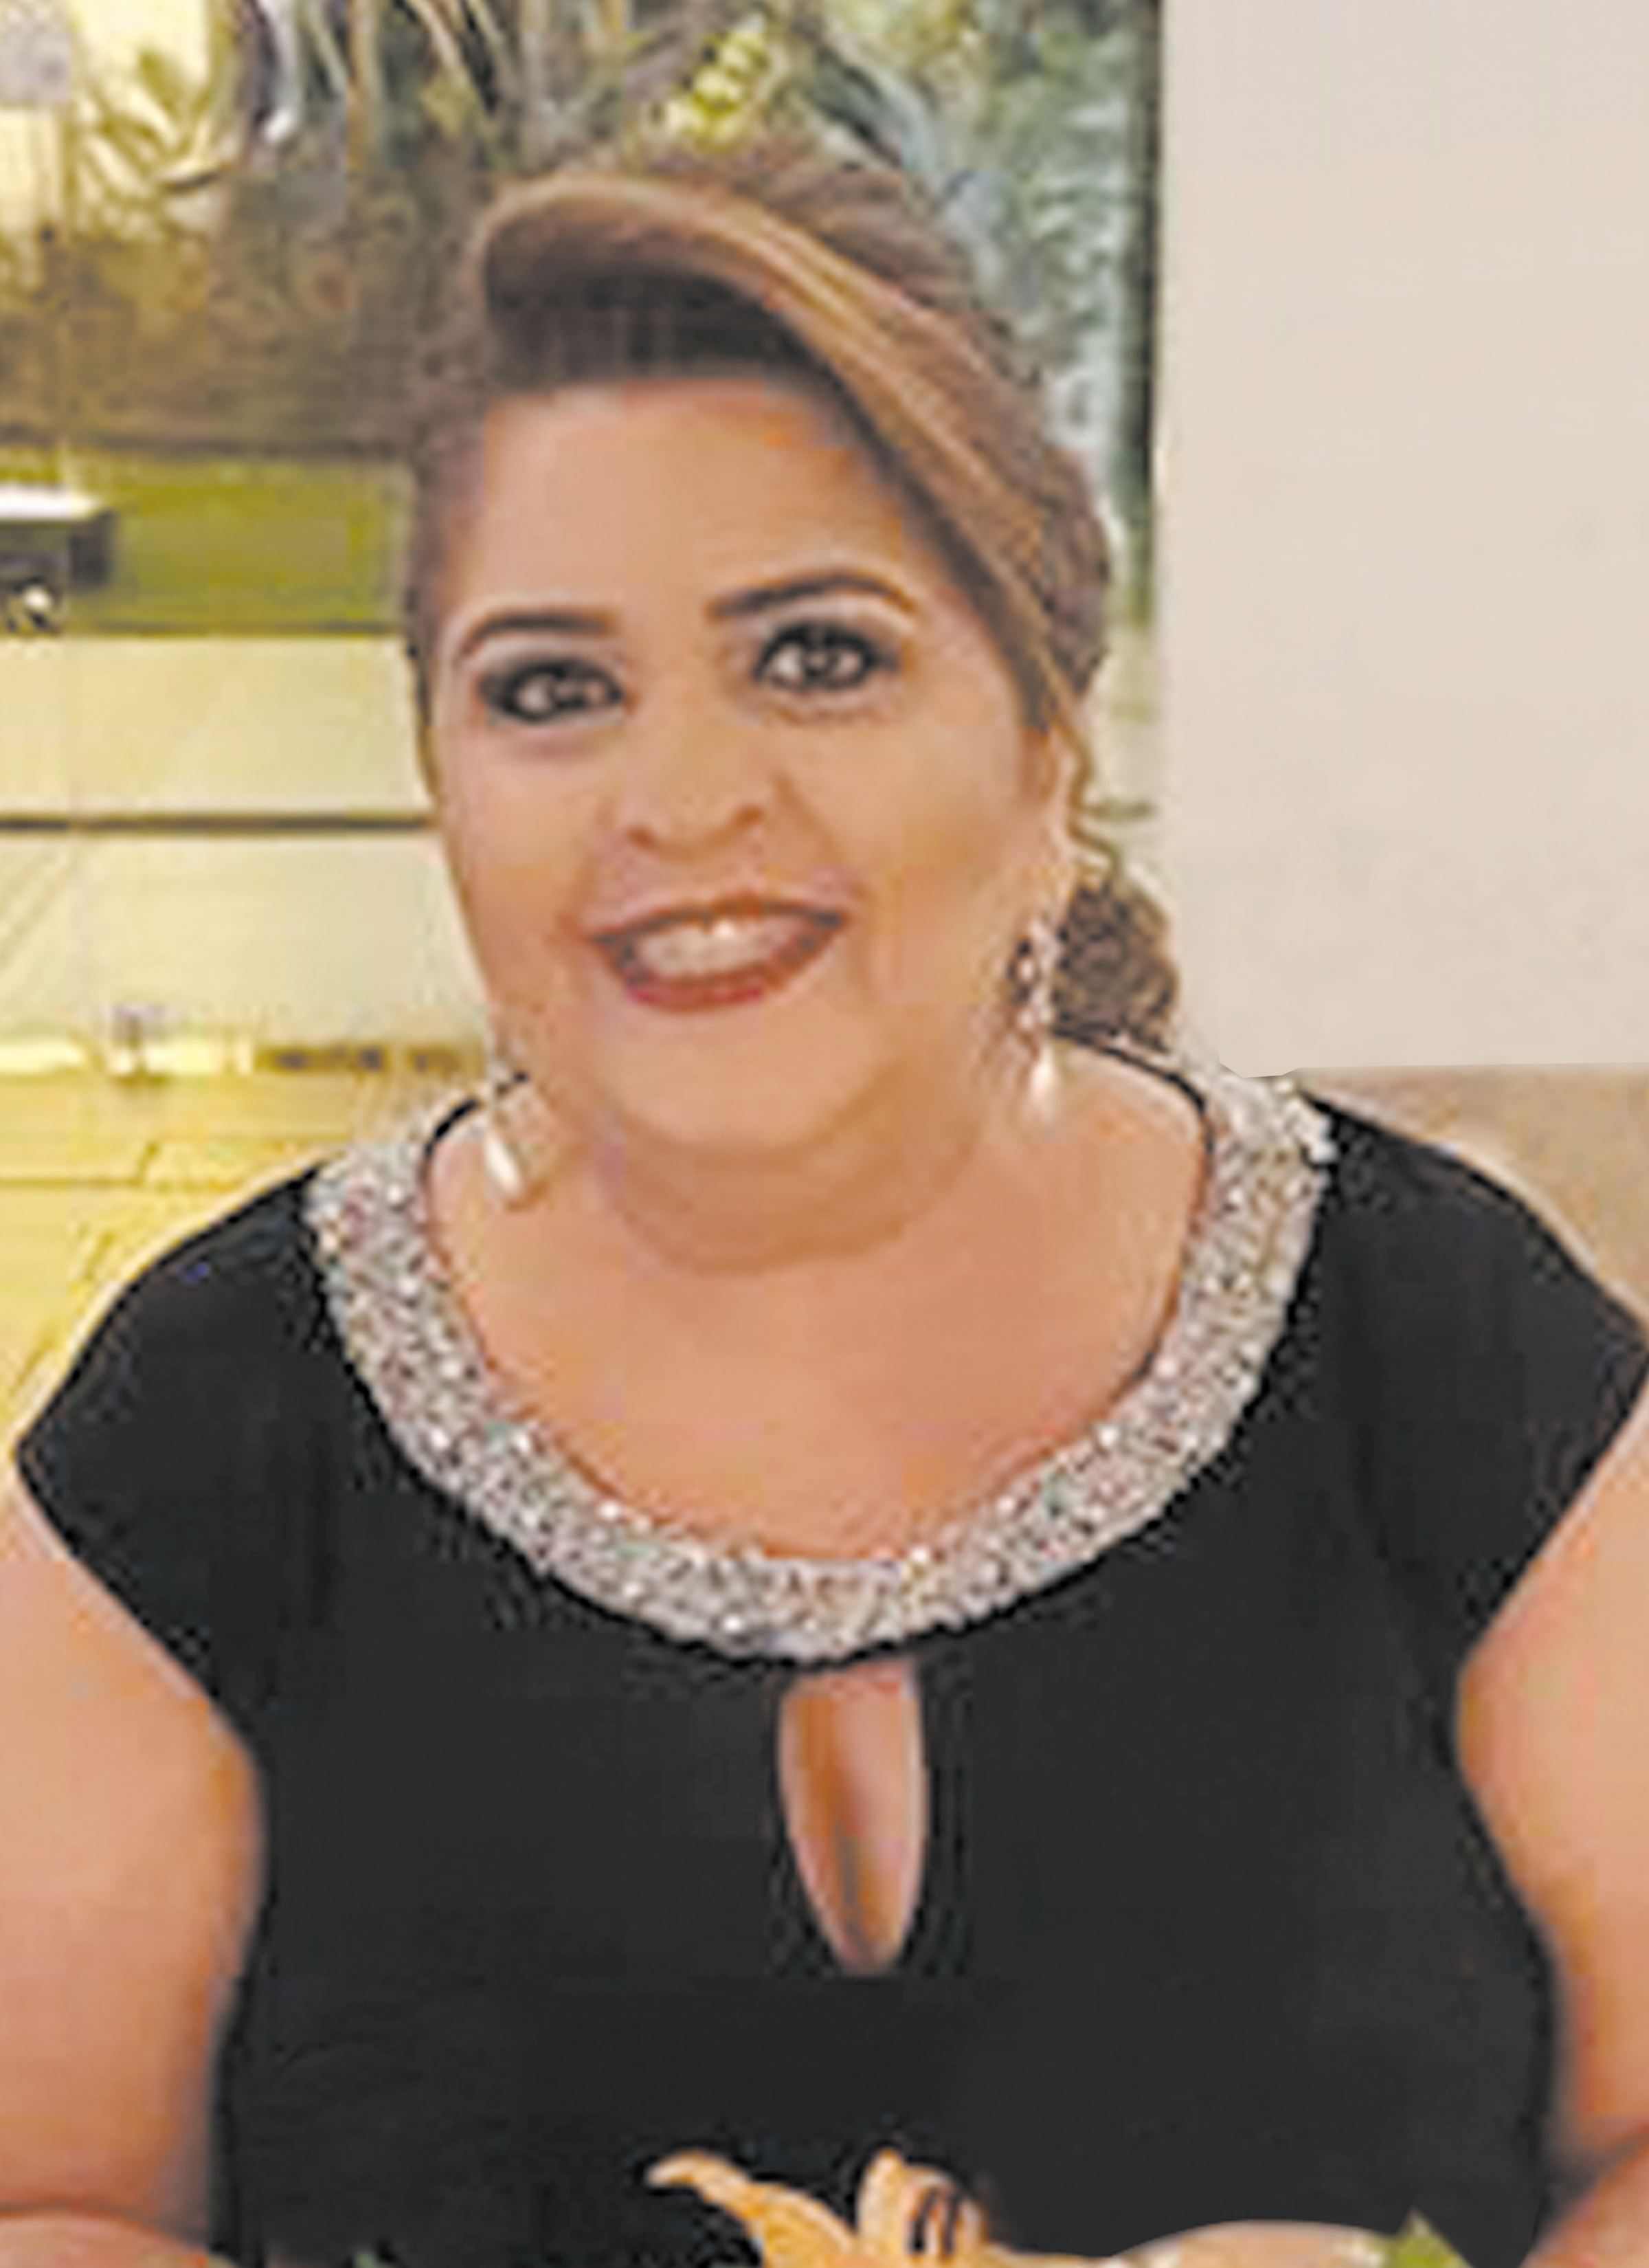 Maria Cristina Chaul Barbosa